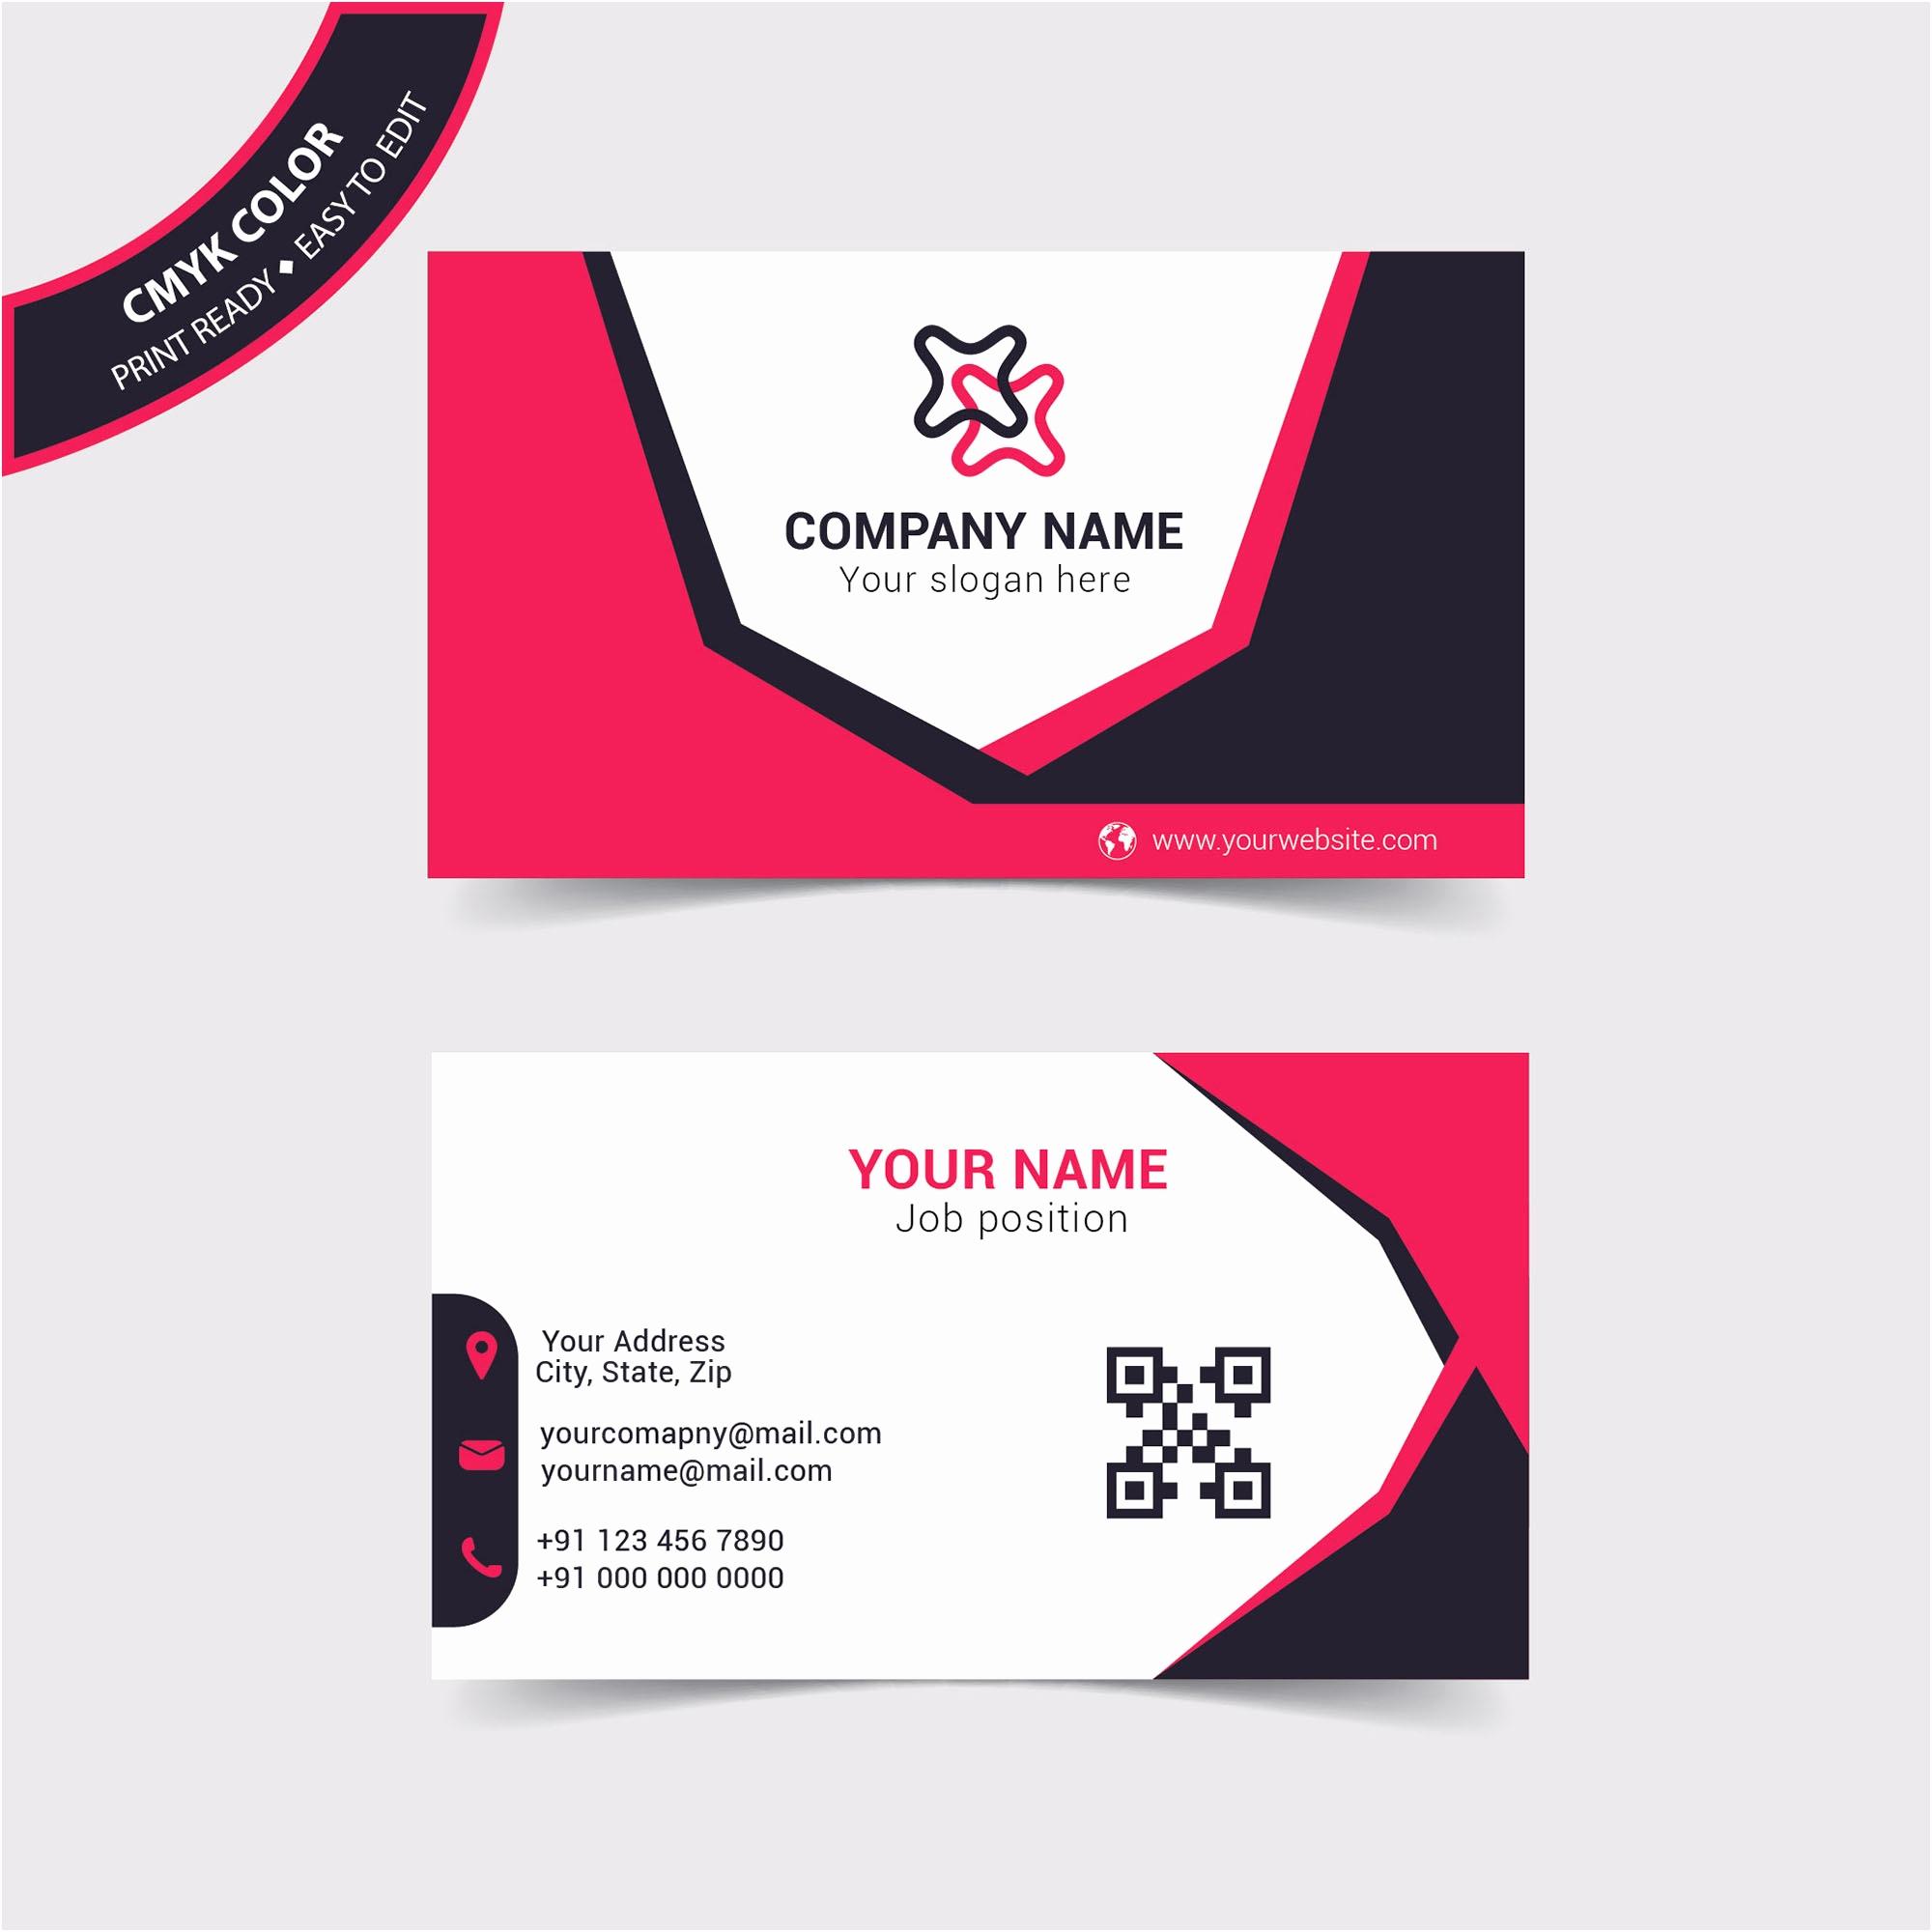 Business Card Maker Online New Business Card Maker Line Free - Online Business Card Maker Free Printable